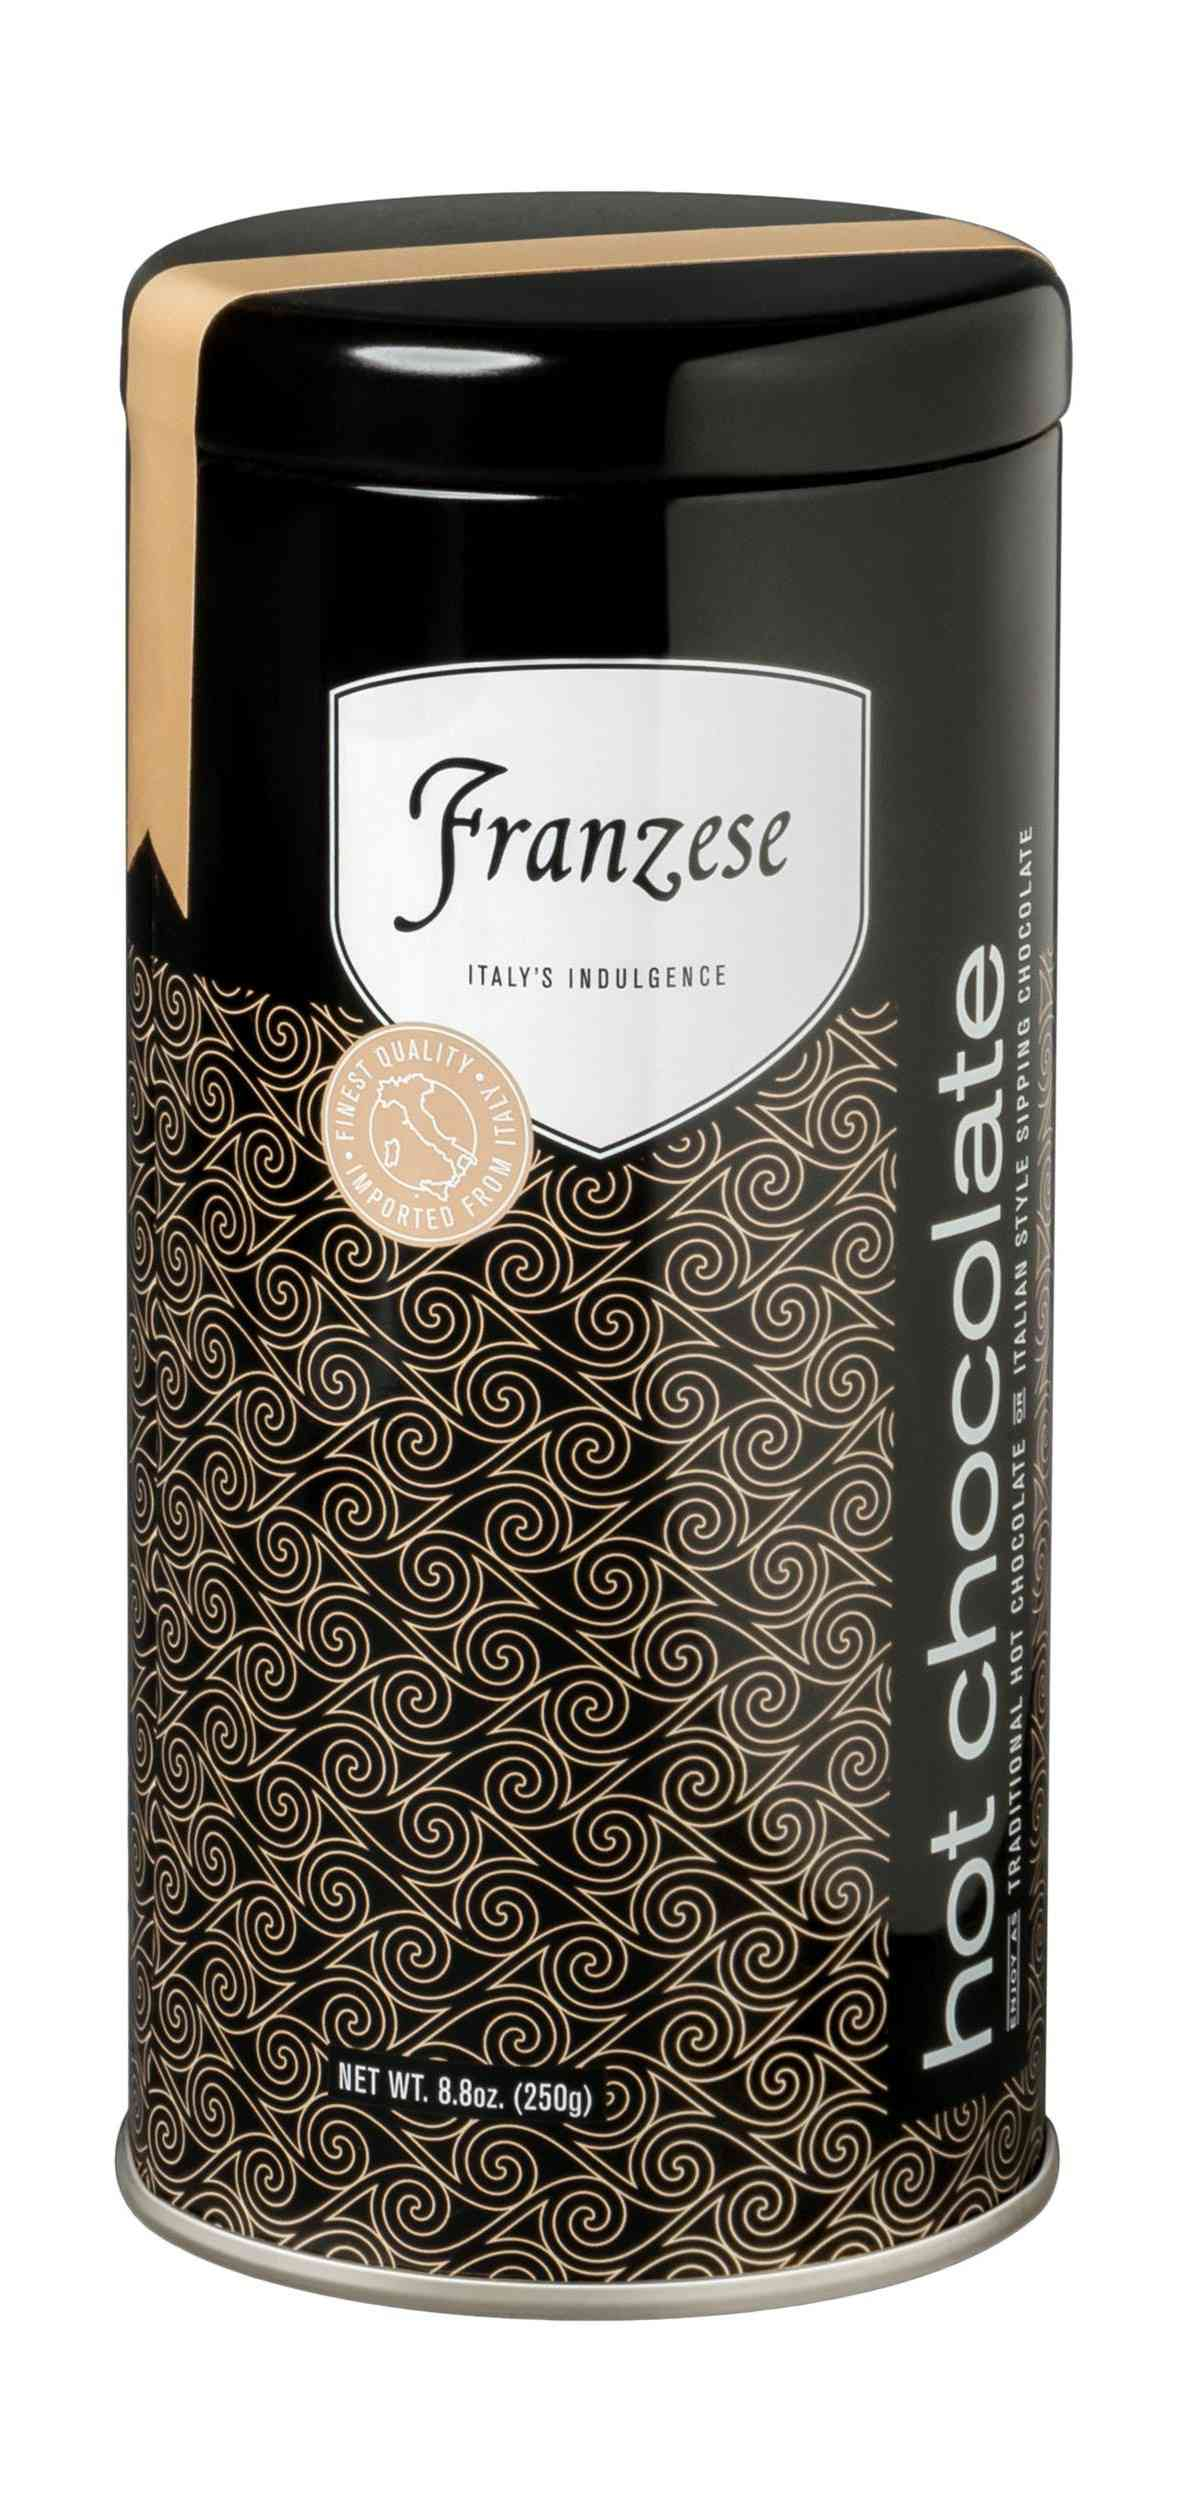 Franzese Hot Chocolate Mix